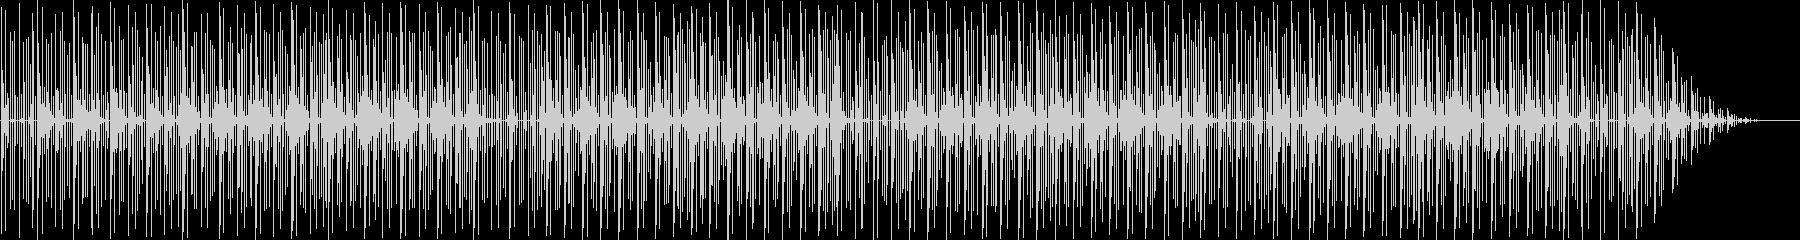 bgm46の未再生の波形